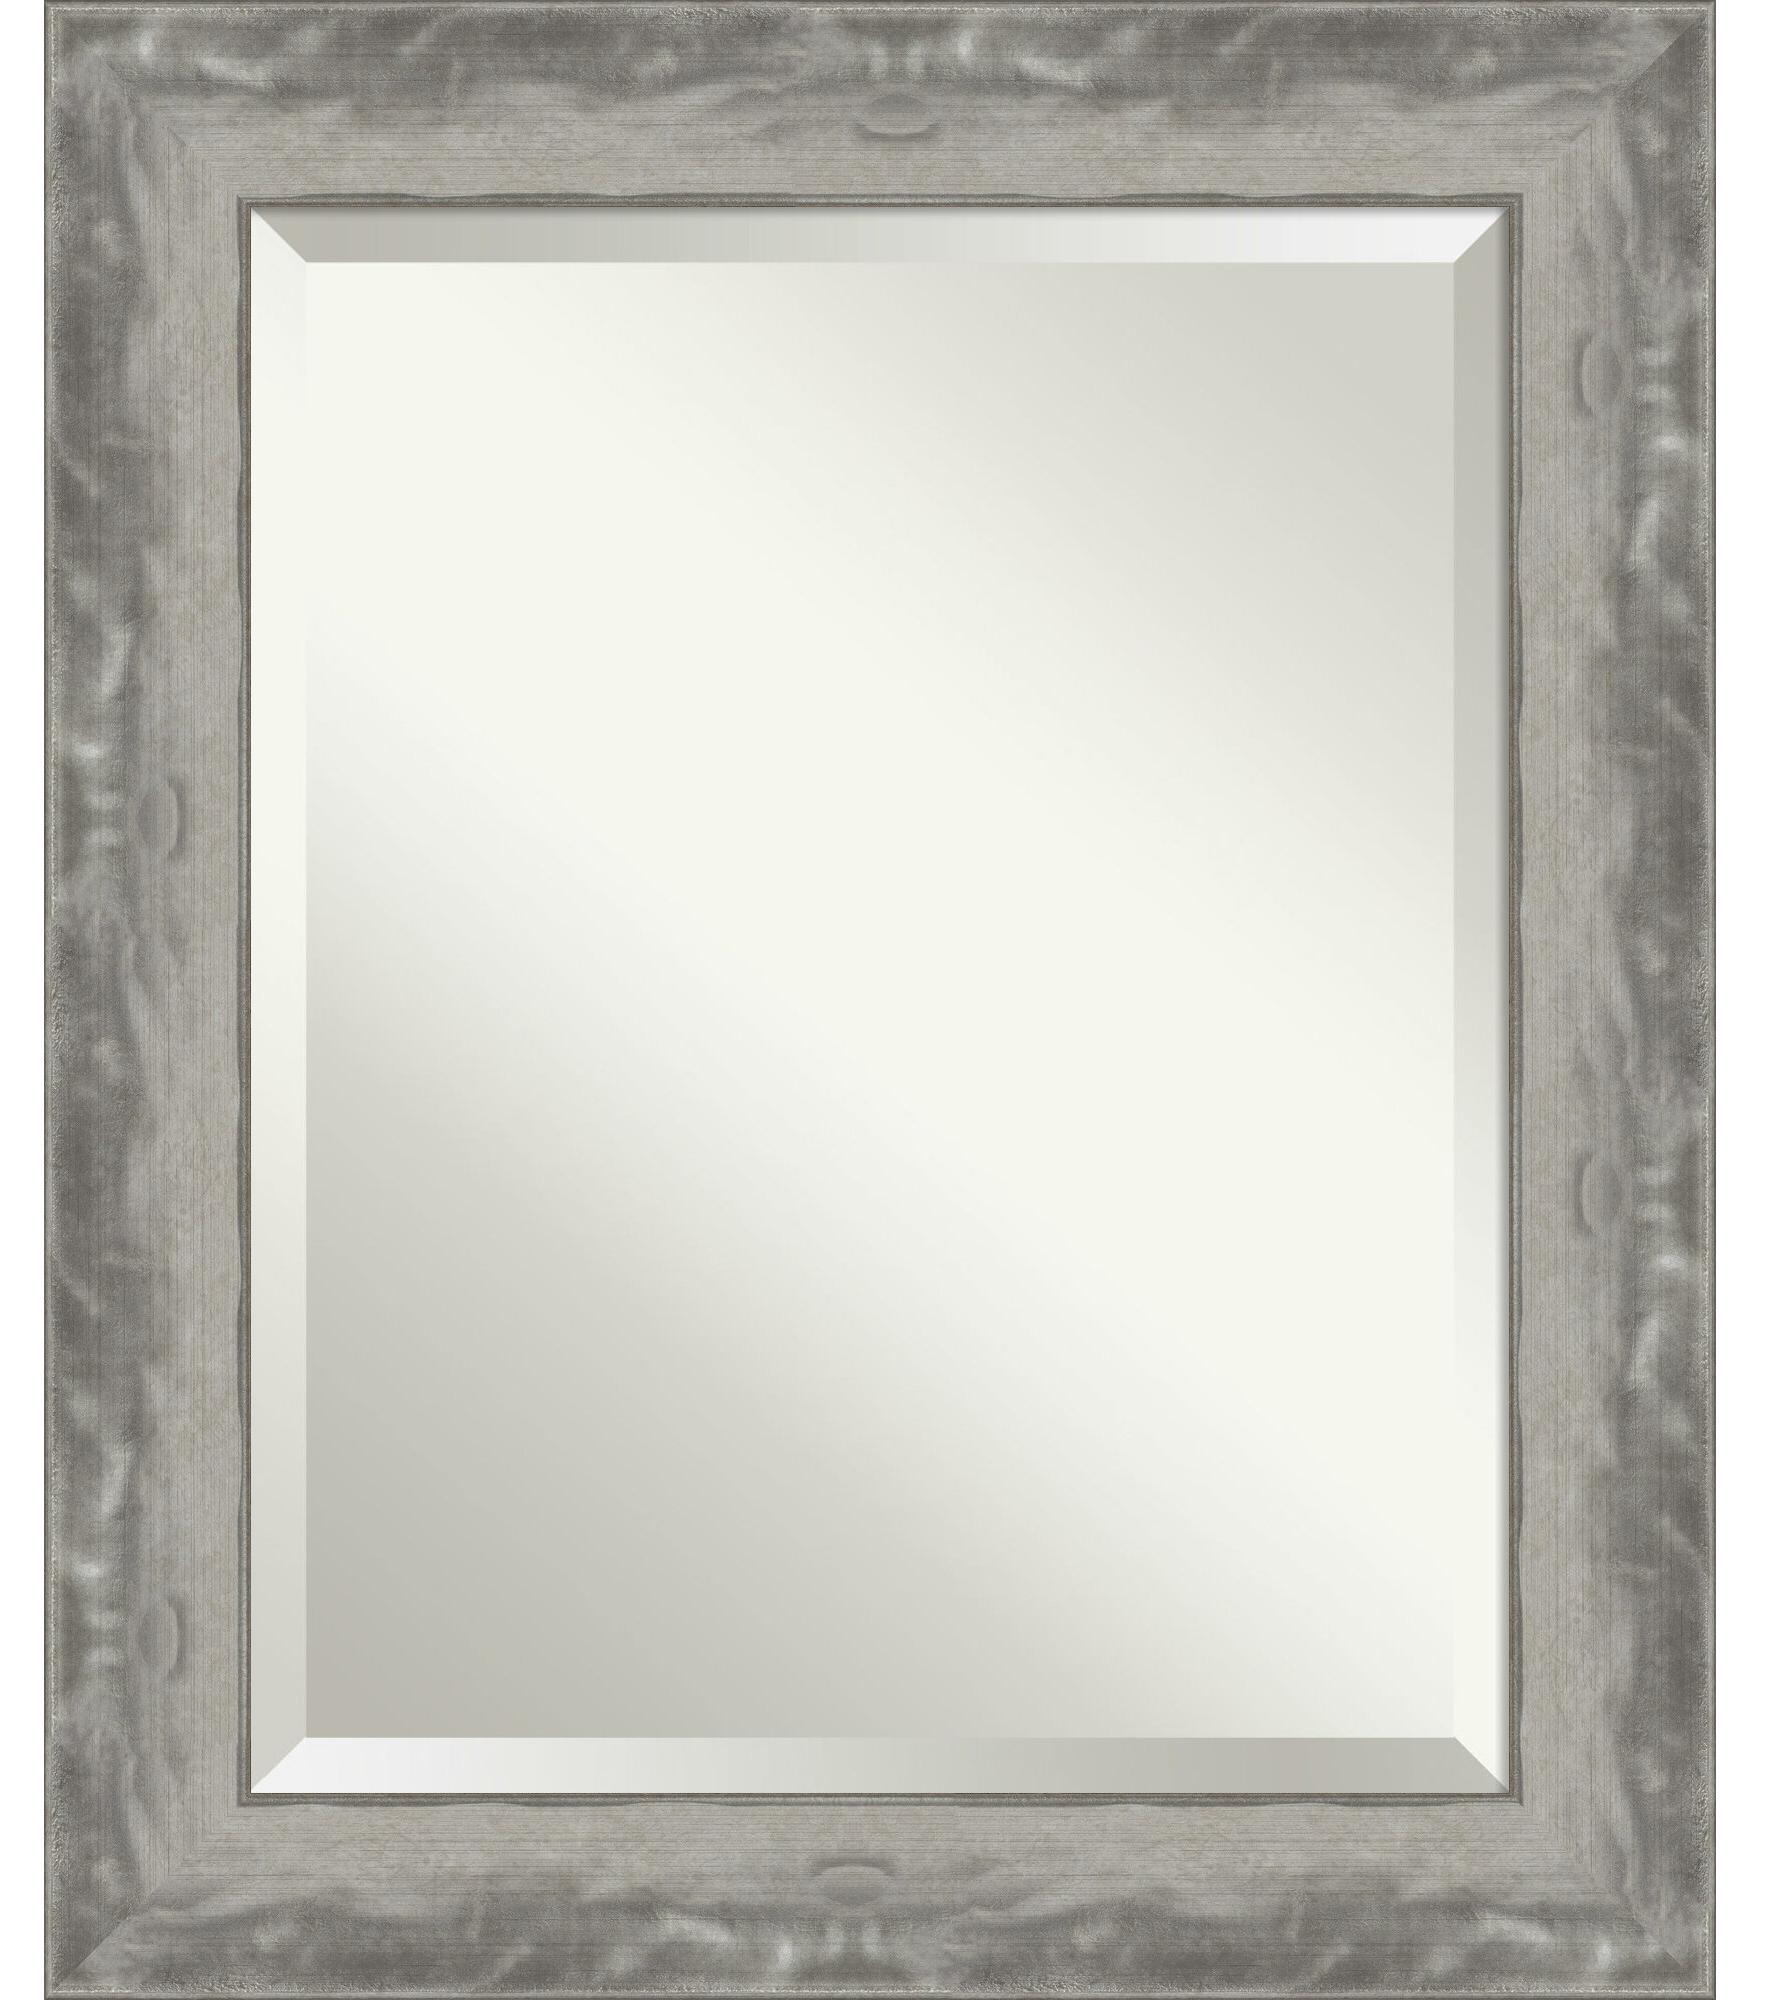 2020 Narrow Wall Mirrors With Michael Narrow Beveled Wall Mirror (View 7 of 20)